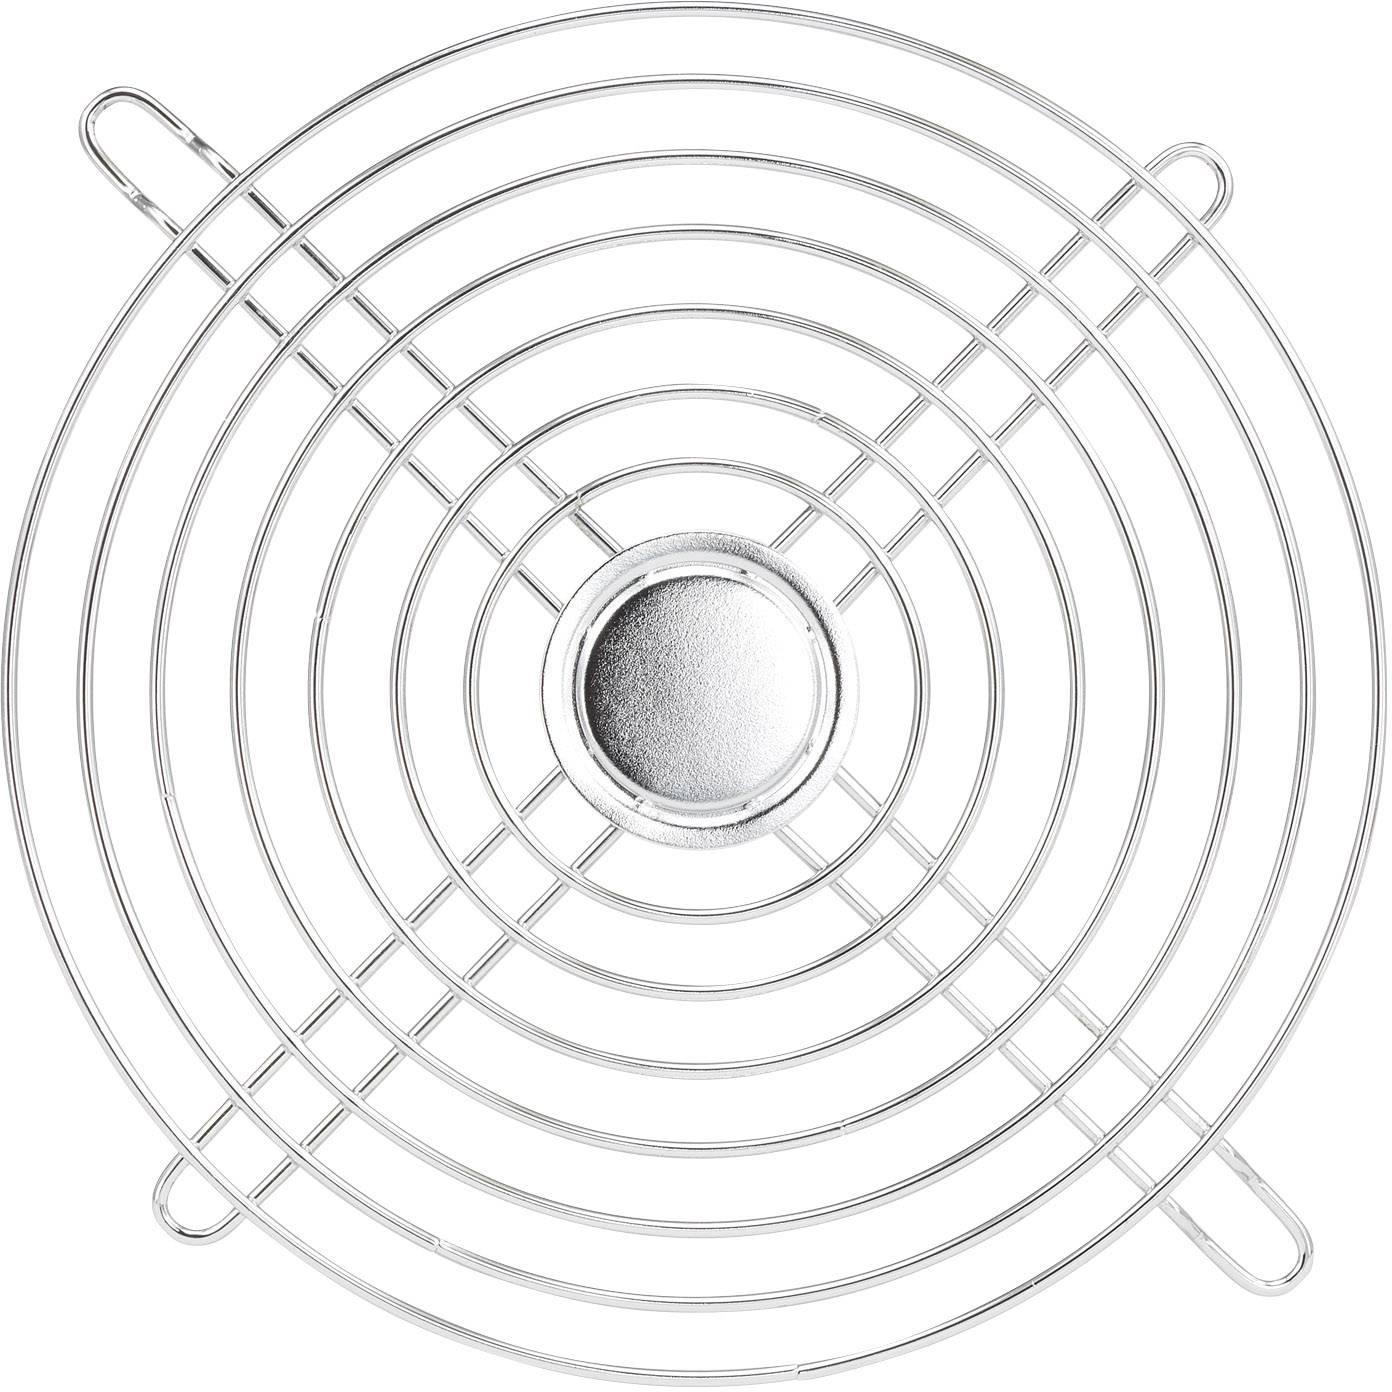 Vetracia mriežka PROFAN Technology 1408558, (š x v) 170 mm x 170 mm, kov, 1 ks